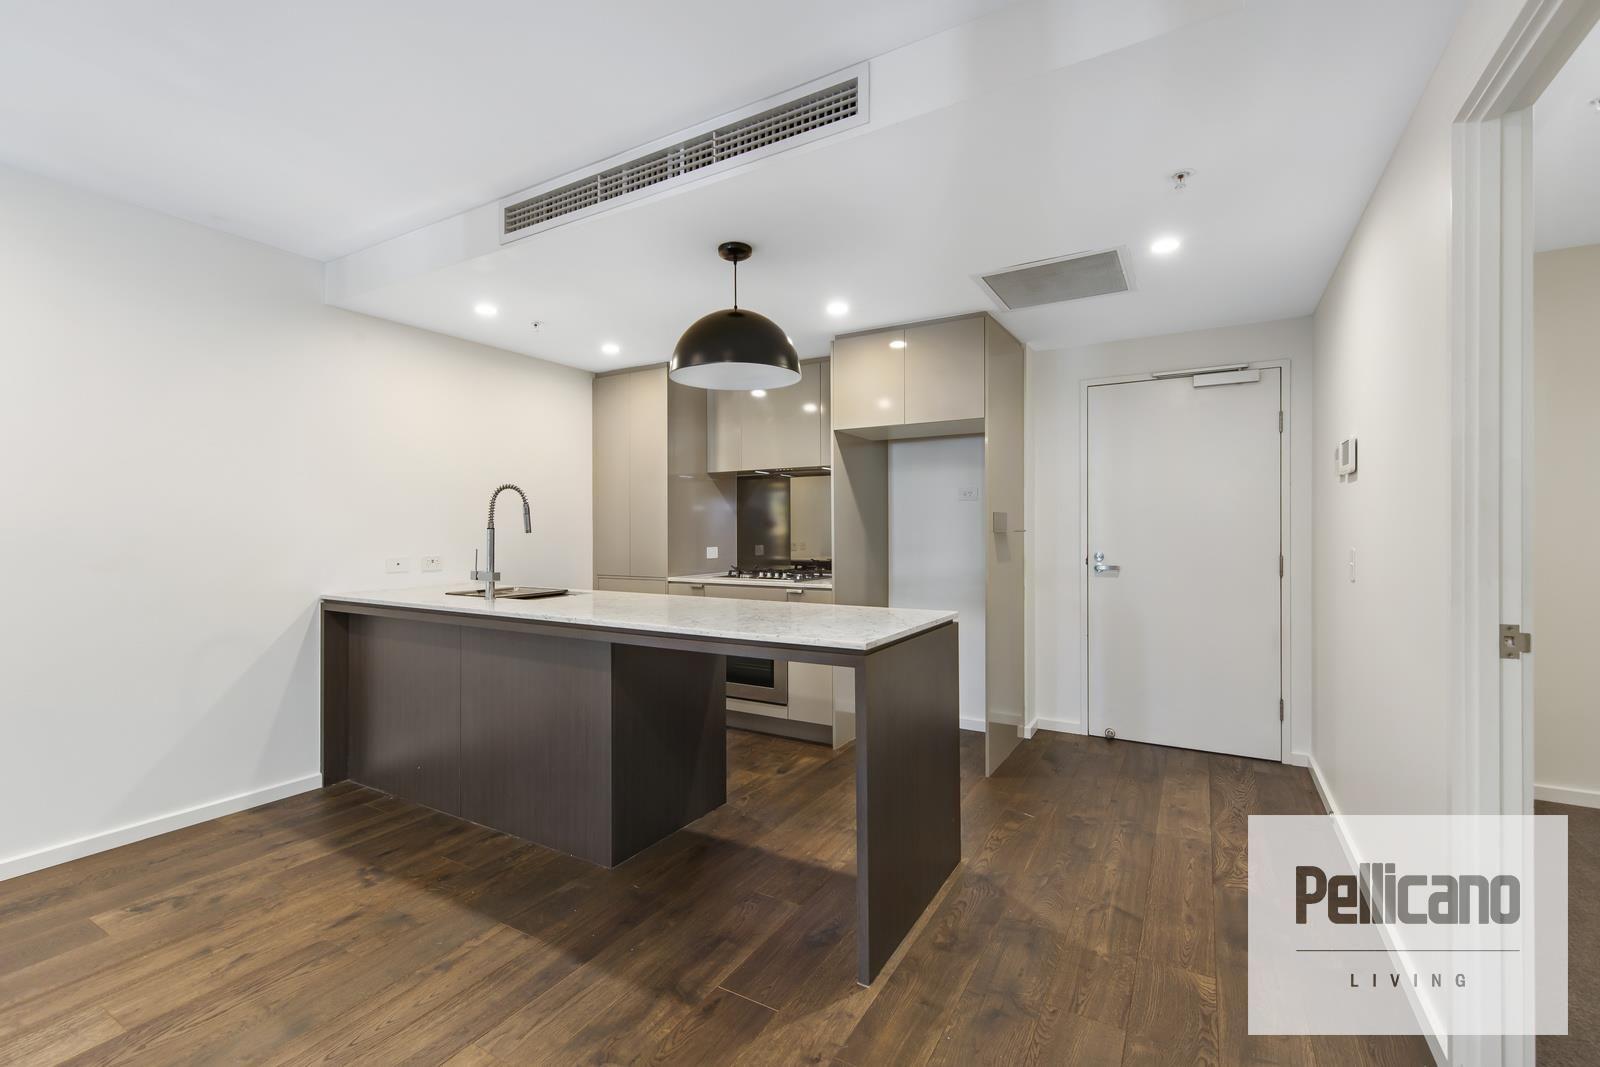 2 bedrooms Apartment / Unit / Flat in 908/148 Logan Road WOOLLOONGABBA QLD, 4102